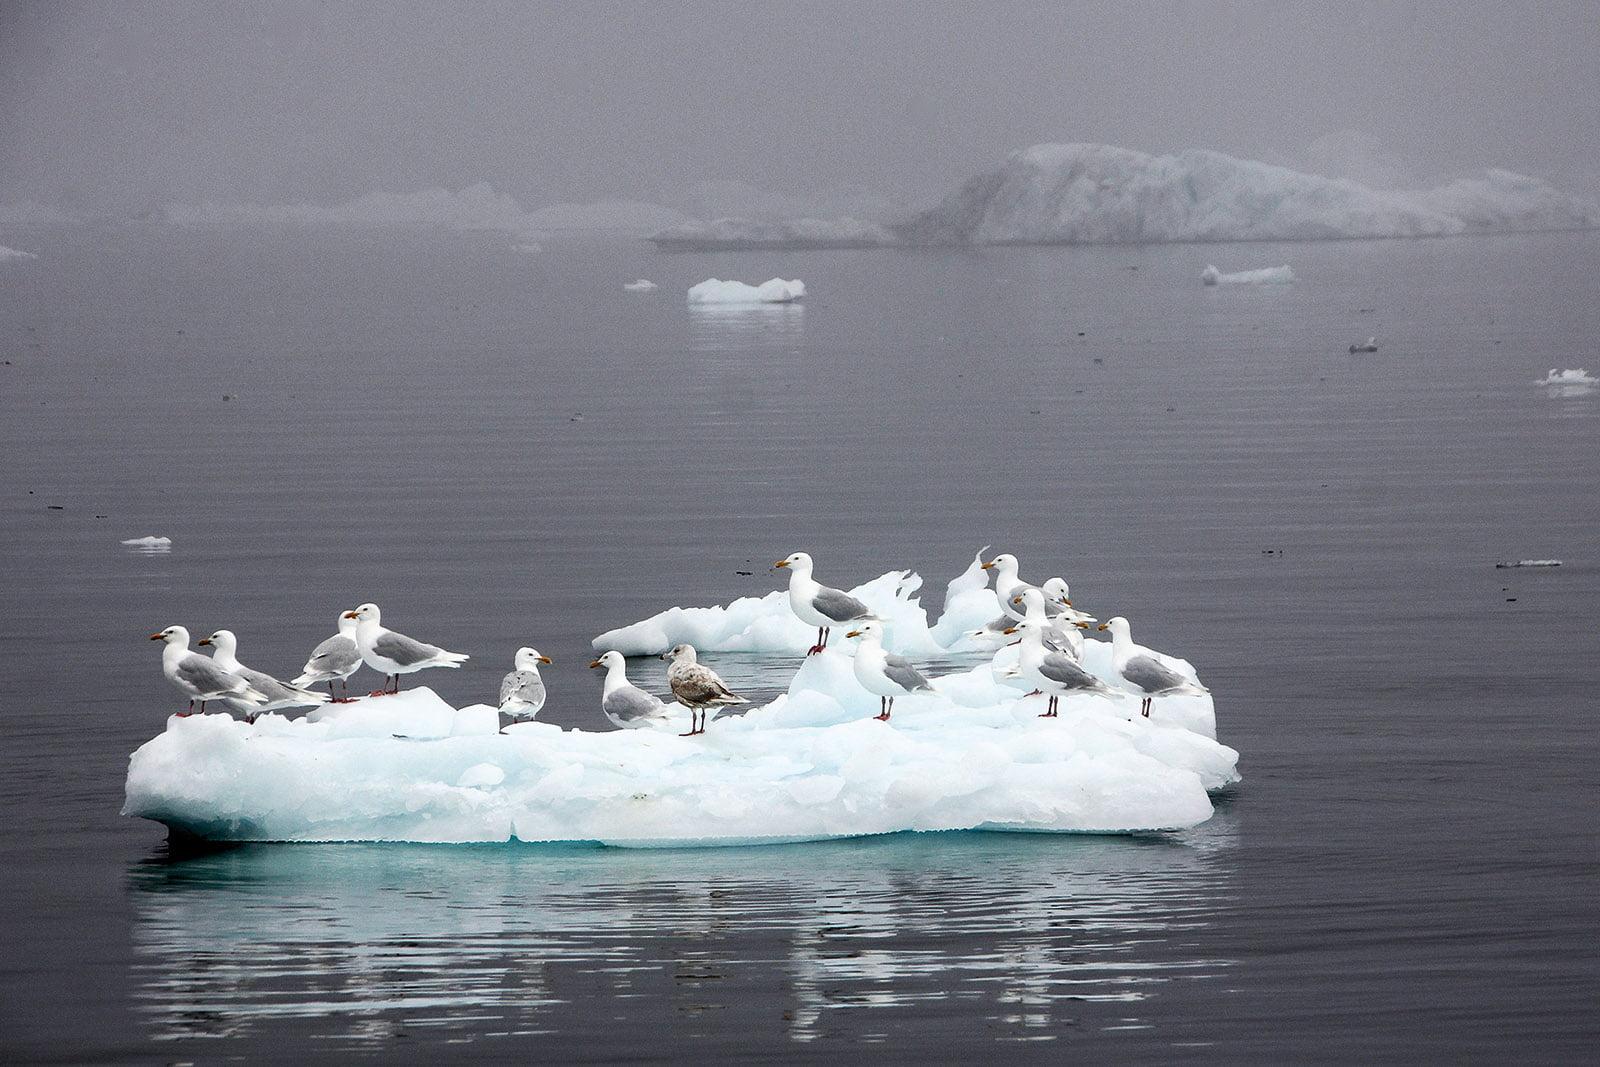 Melting glaciers in Greenland emit large amounts of mercury 1